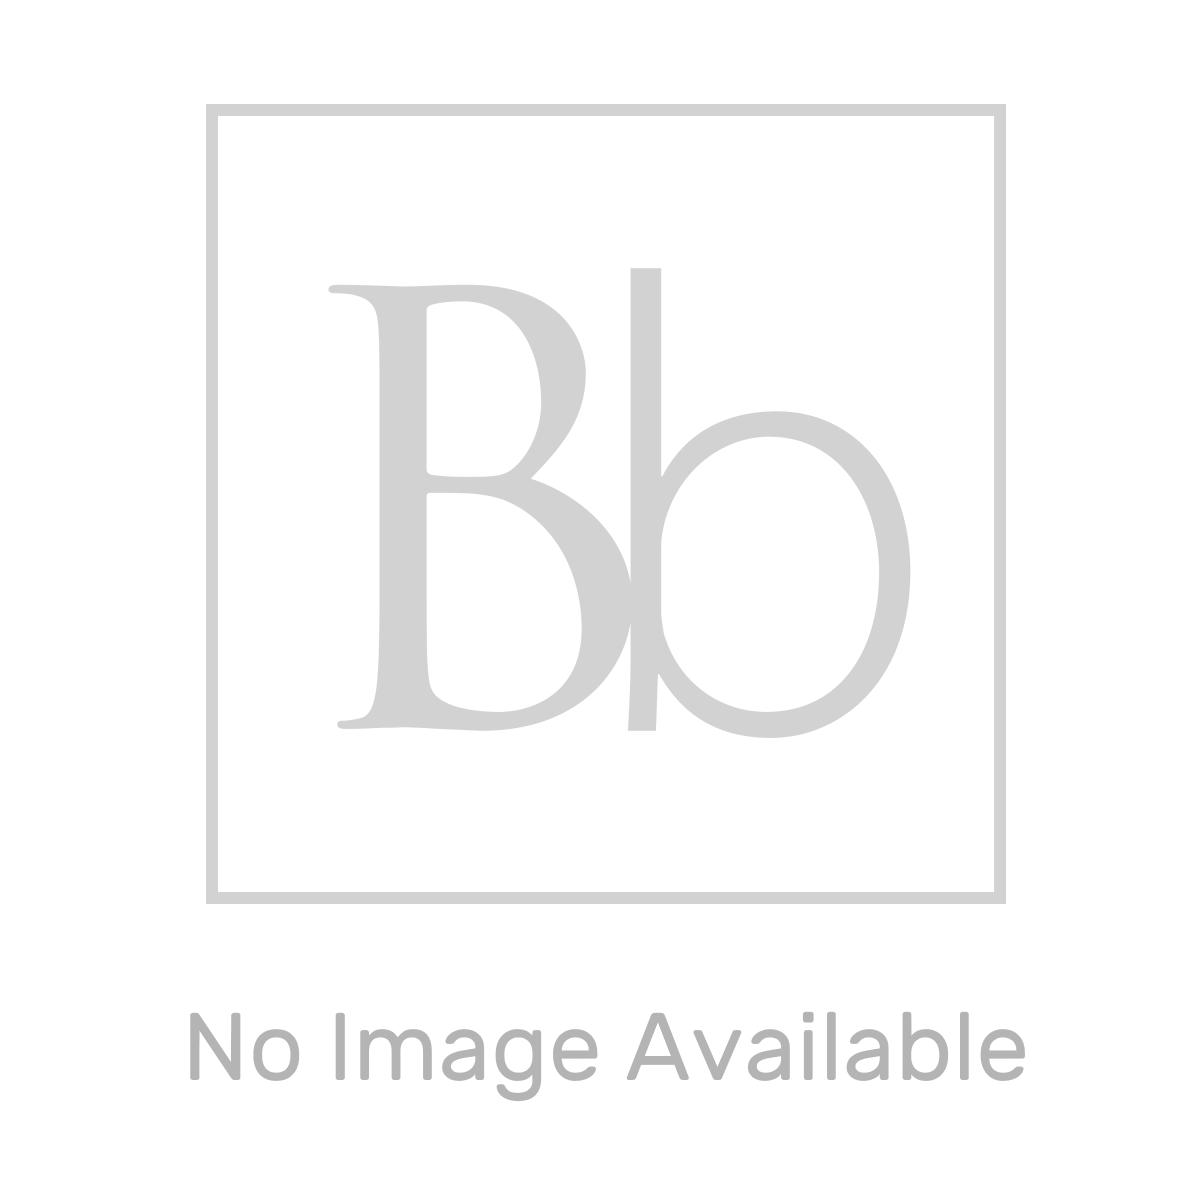 Sanispeed Heavy Duty Pump